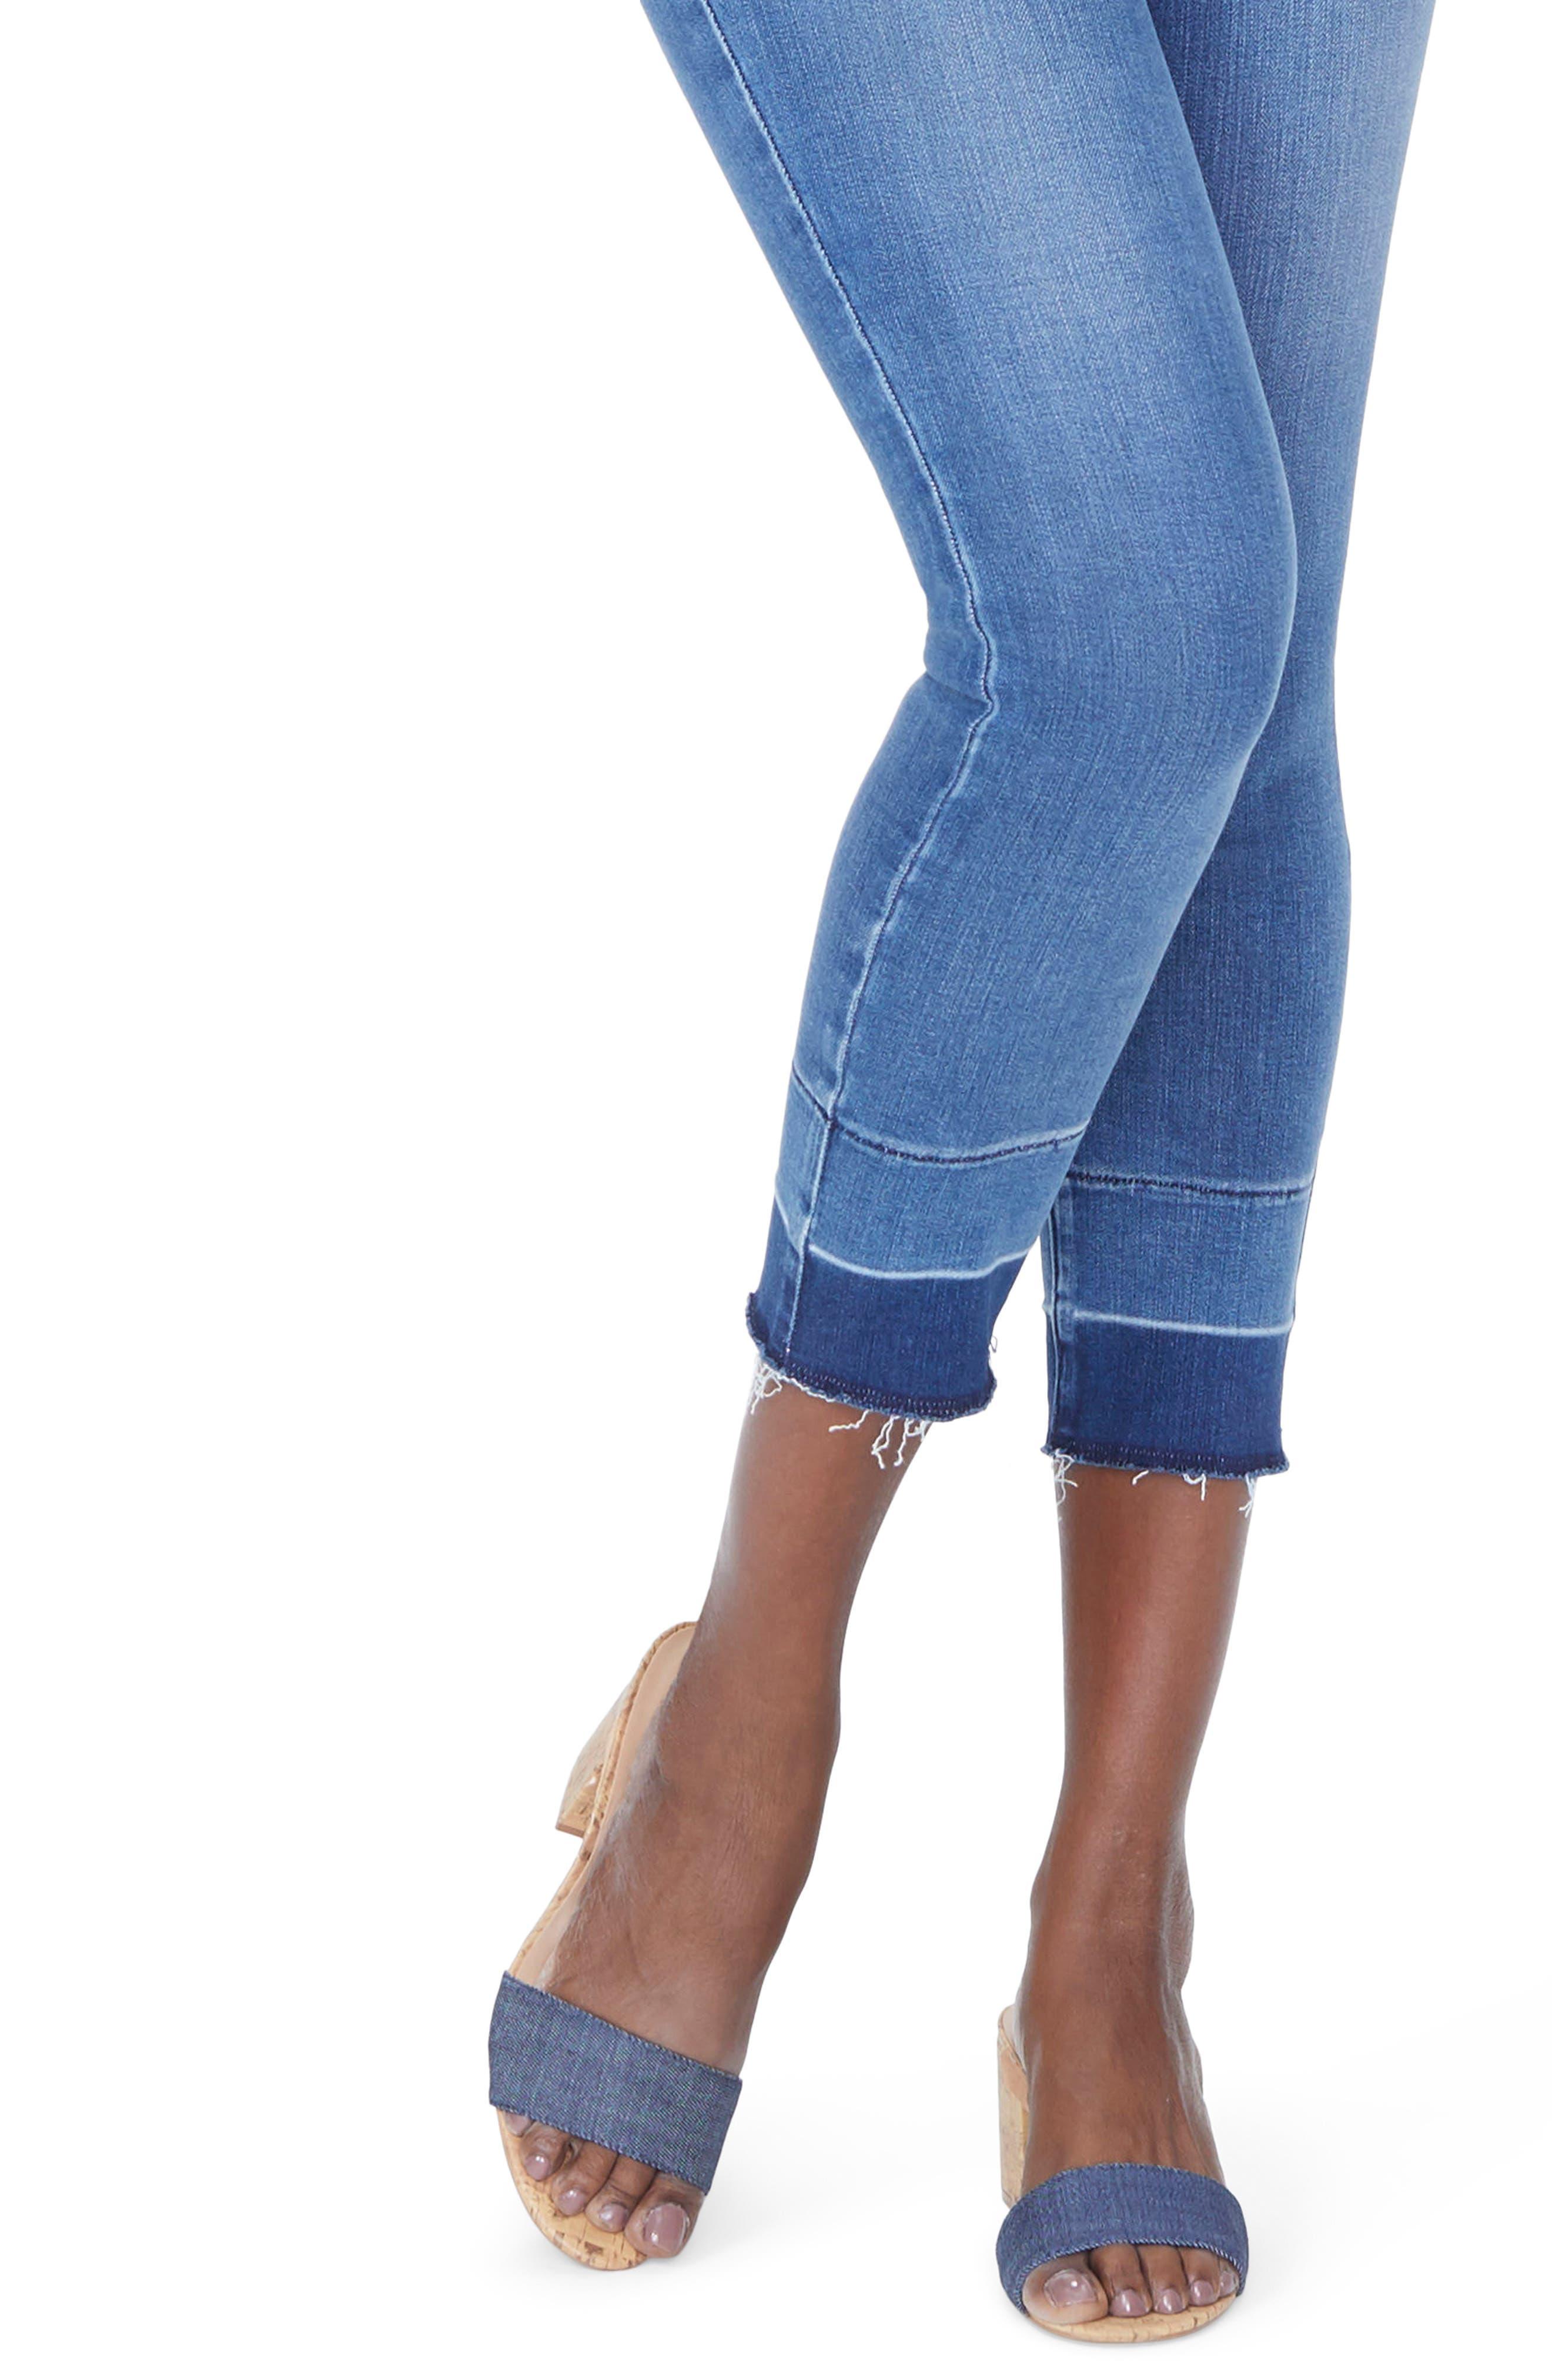 Alina Release Hem Ankle Skinny Jeans,                             Alternate thumbnail 5, color,                             Wishful